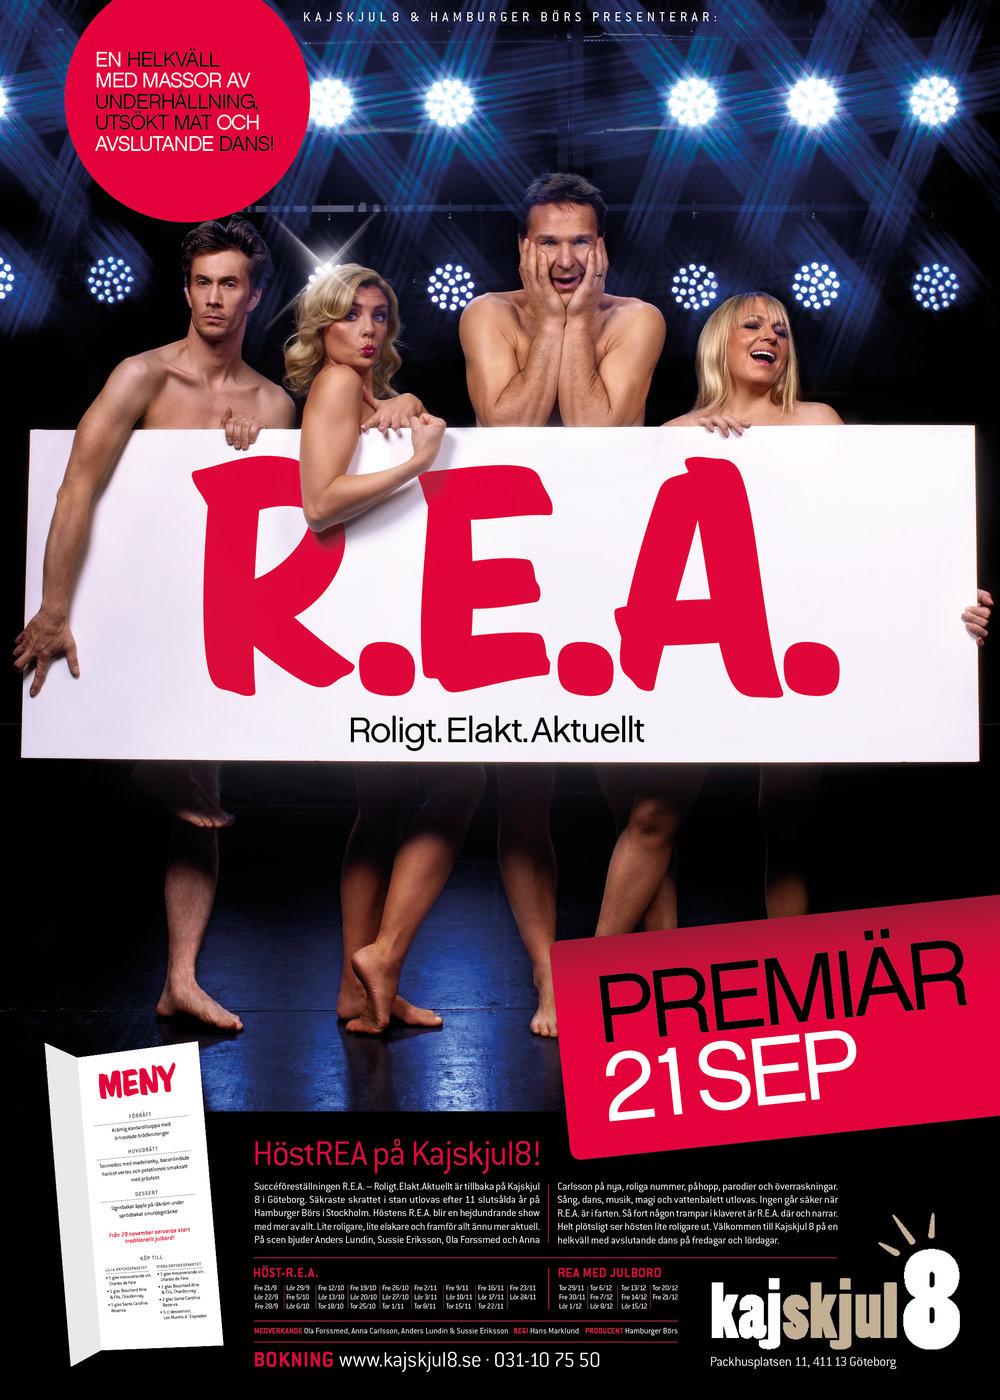 REA2012-Poster-50x70mm-High-120419-01.jpg